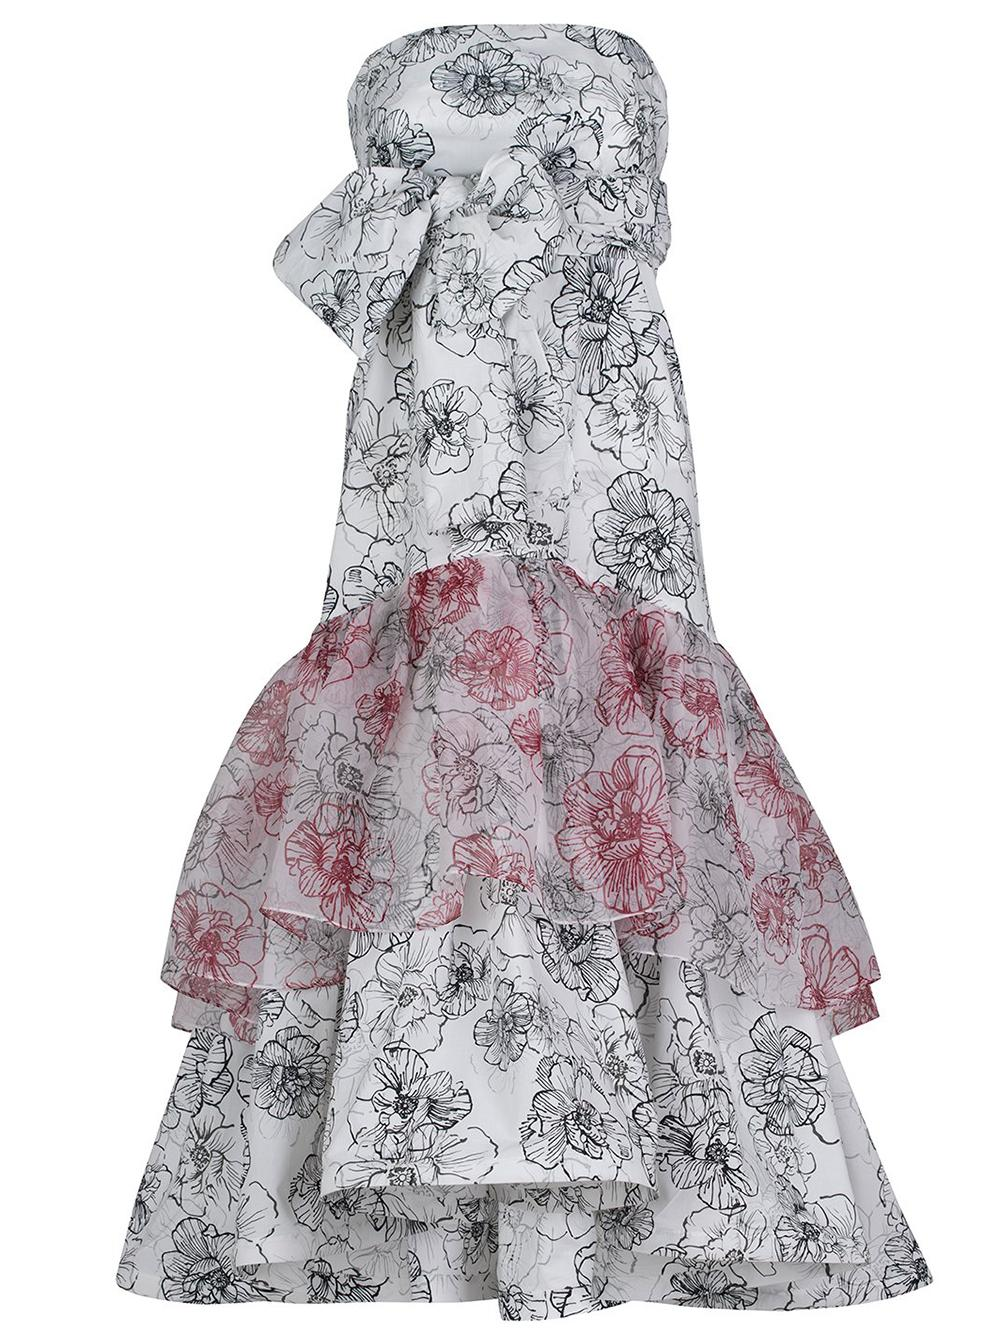 Allerona Dress Item # ALLERONA DRESS